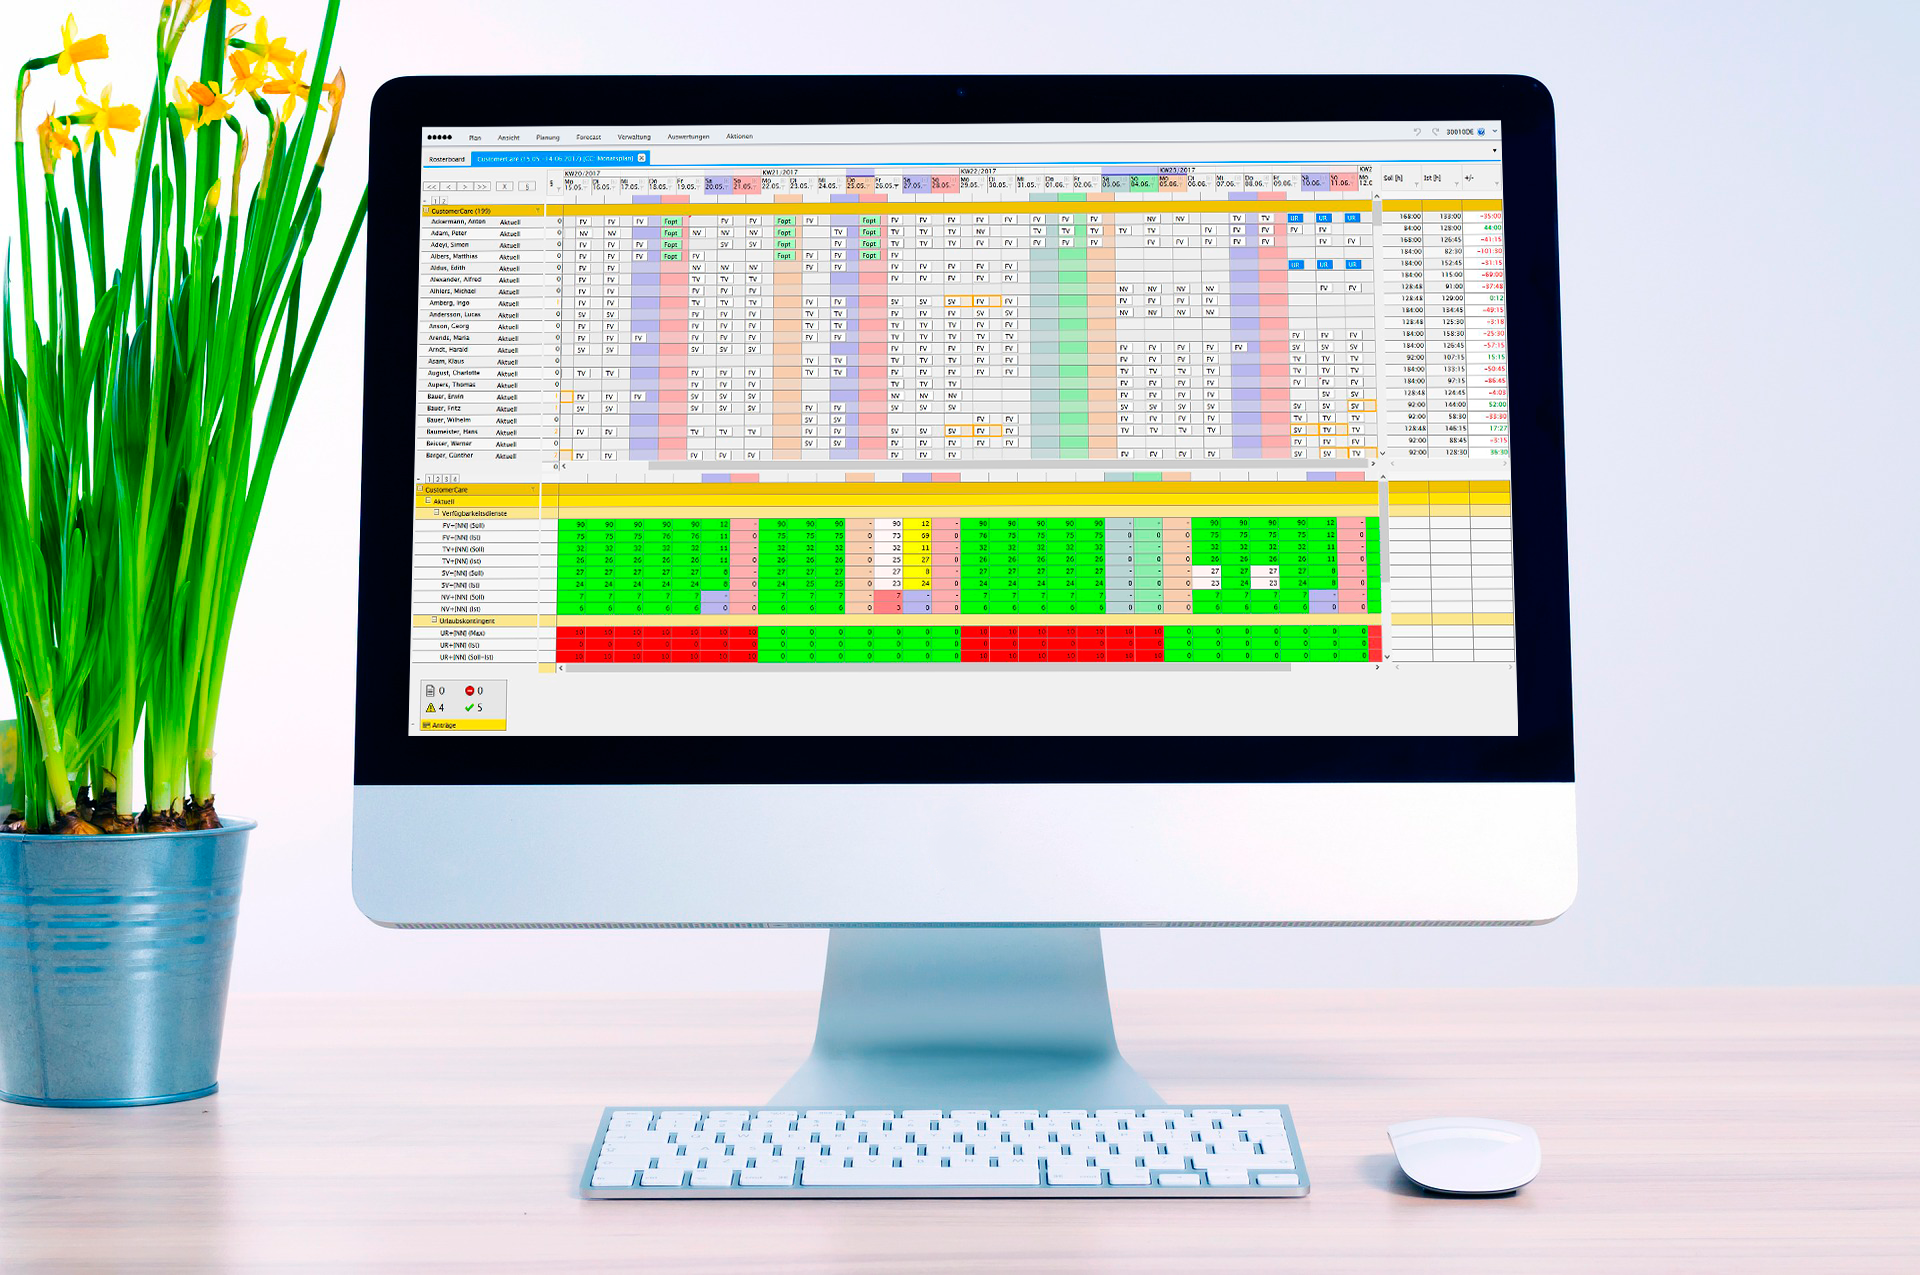 plano. Workforce Management Software - Planungsoberfläche